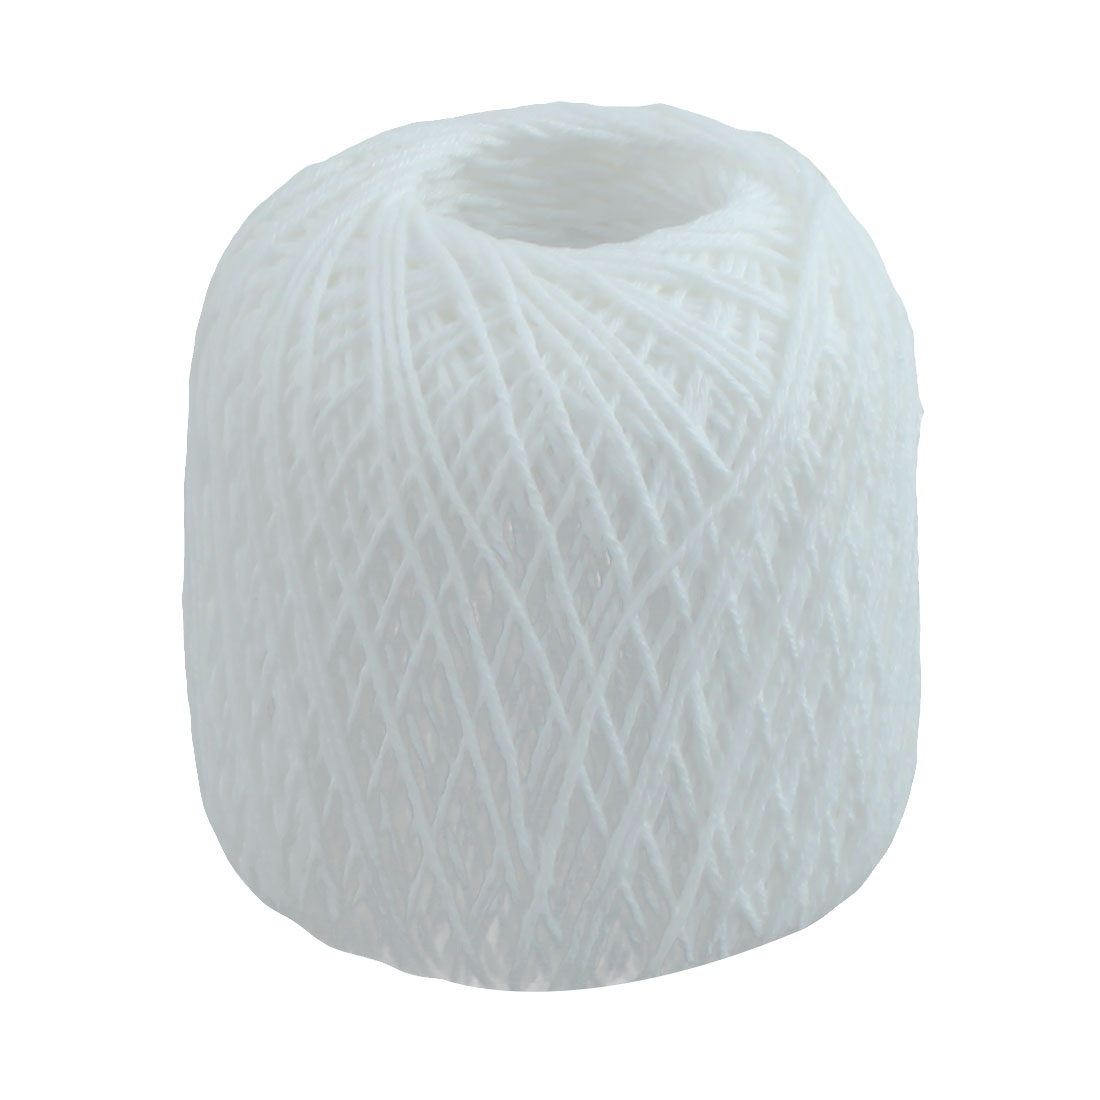 Cotton Hand Knitting Weaving Tatting Crochet Glove Sweater Yarn Thread White